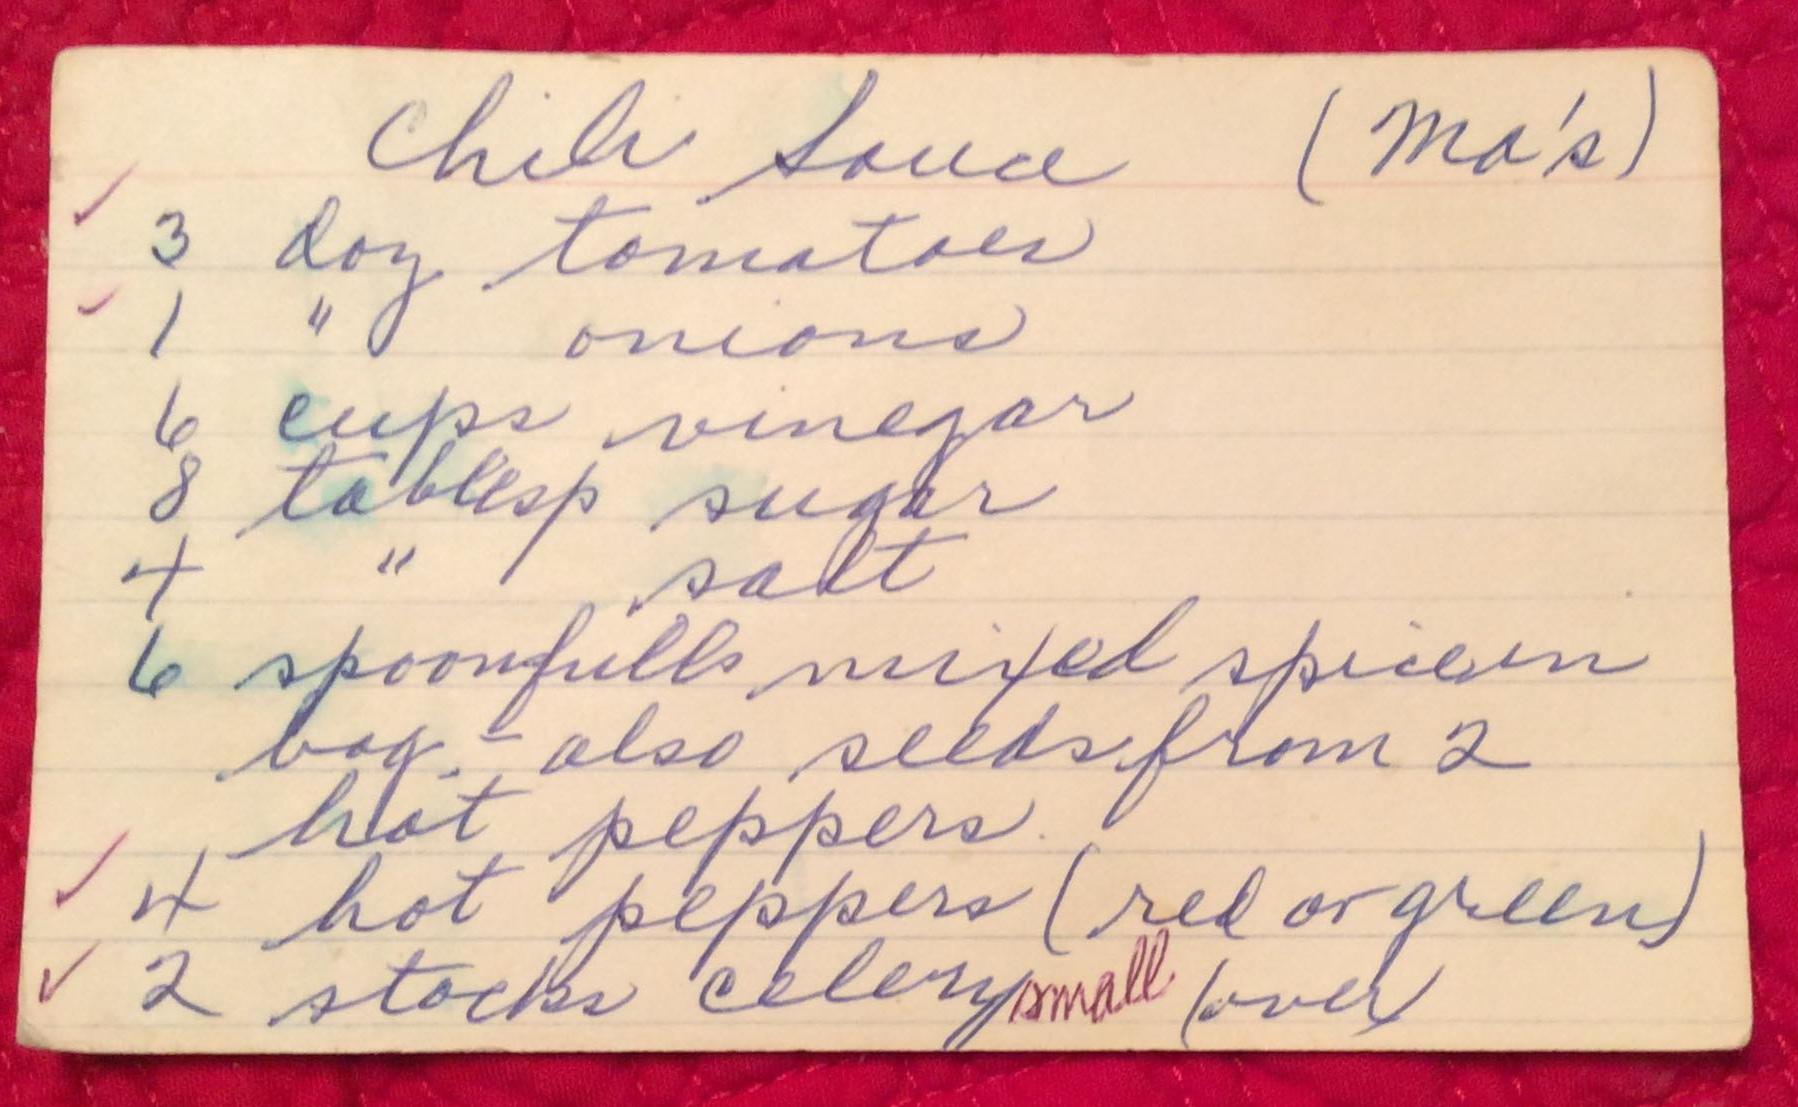 Written in her own hand, Thelma's Chili Sauce recipe